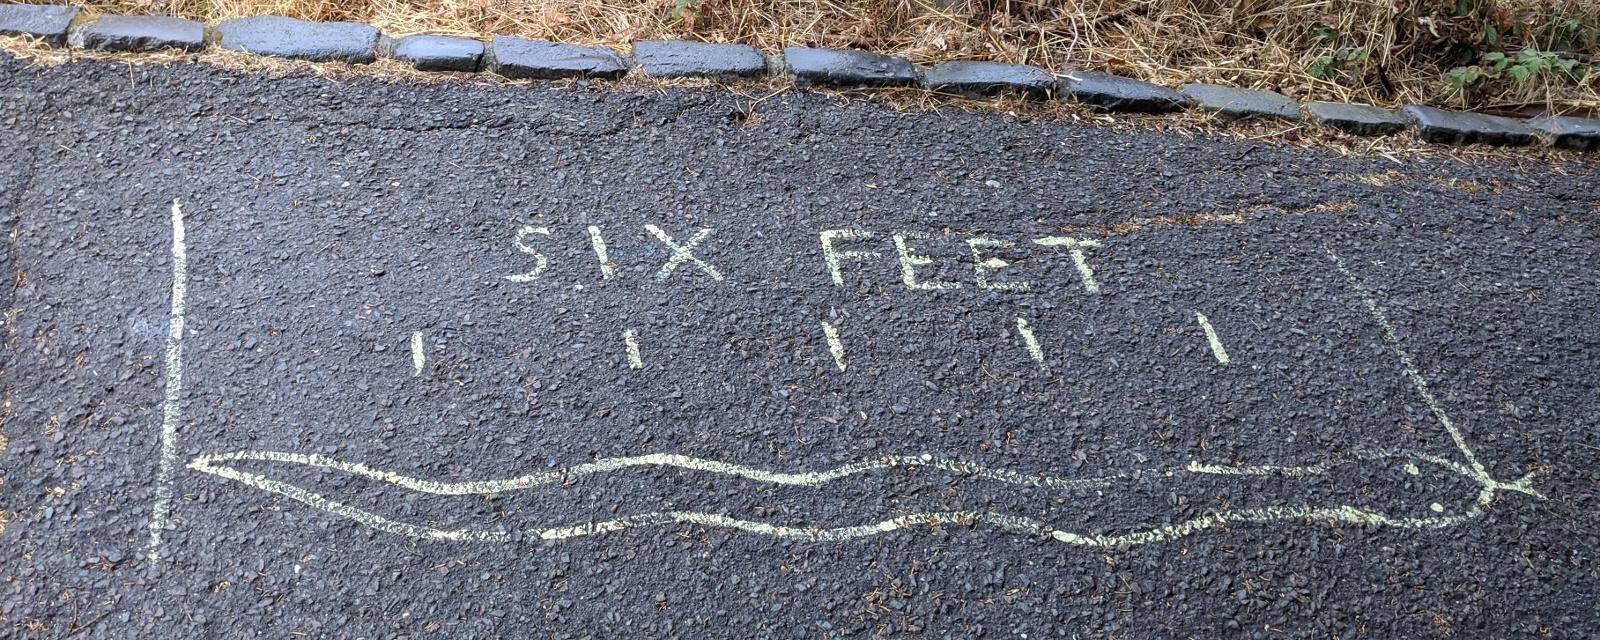 sidewalk art: Six Feet; measurement marks; snake (which has zero feet actually)